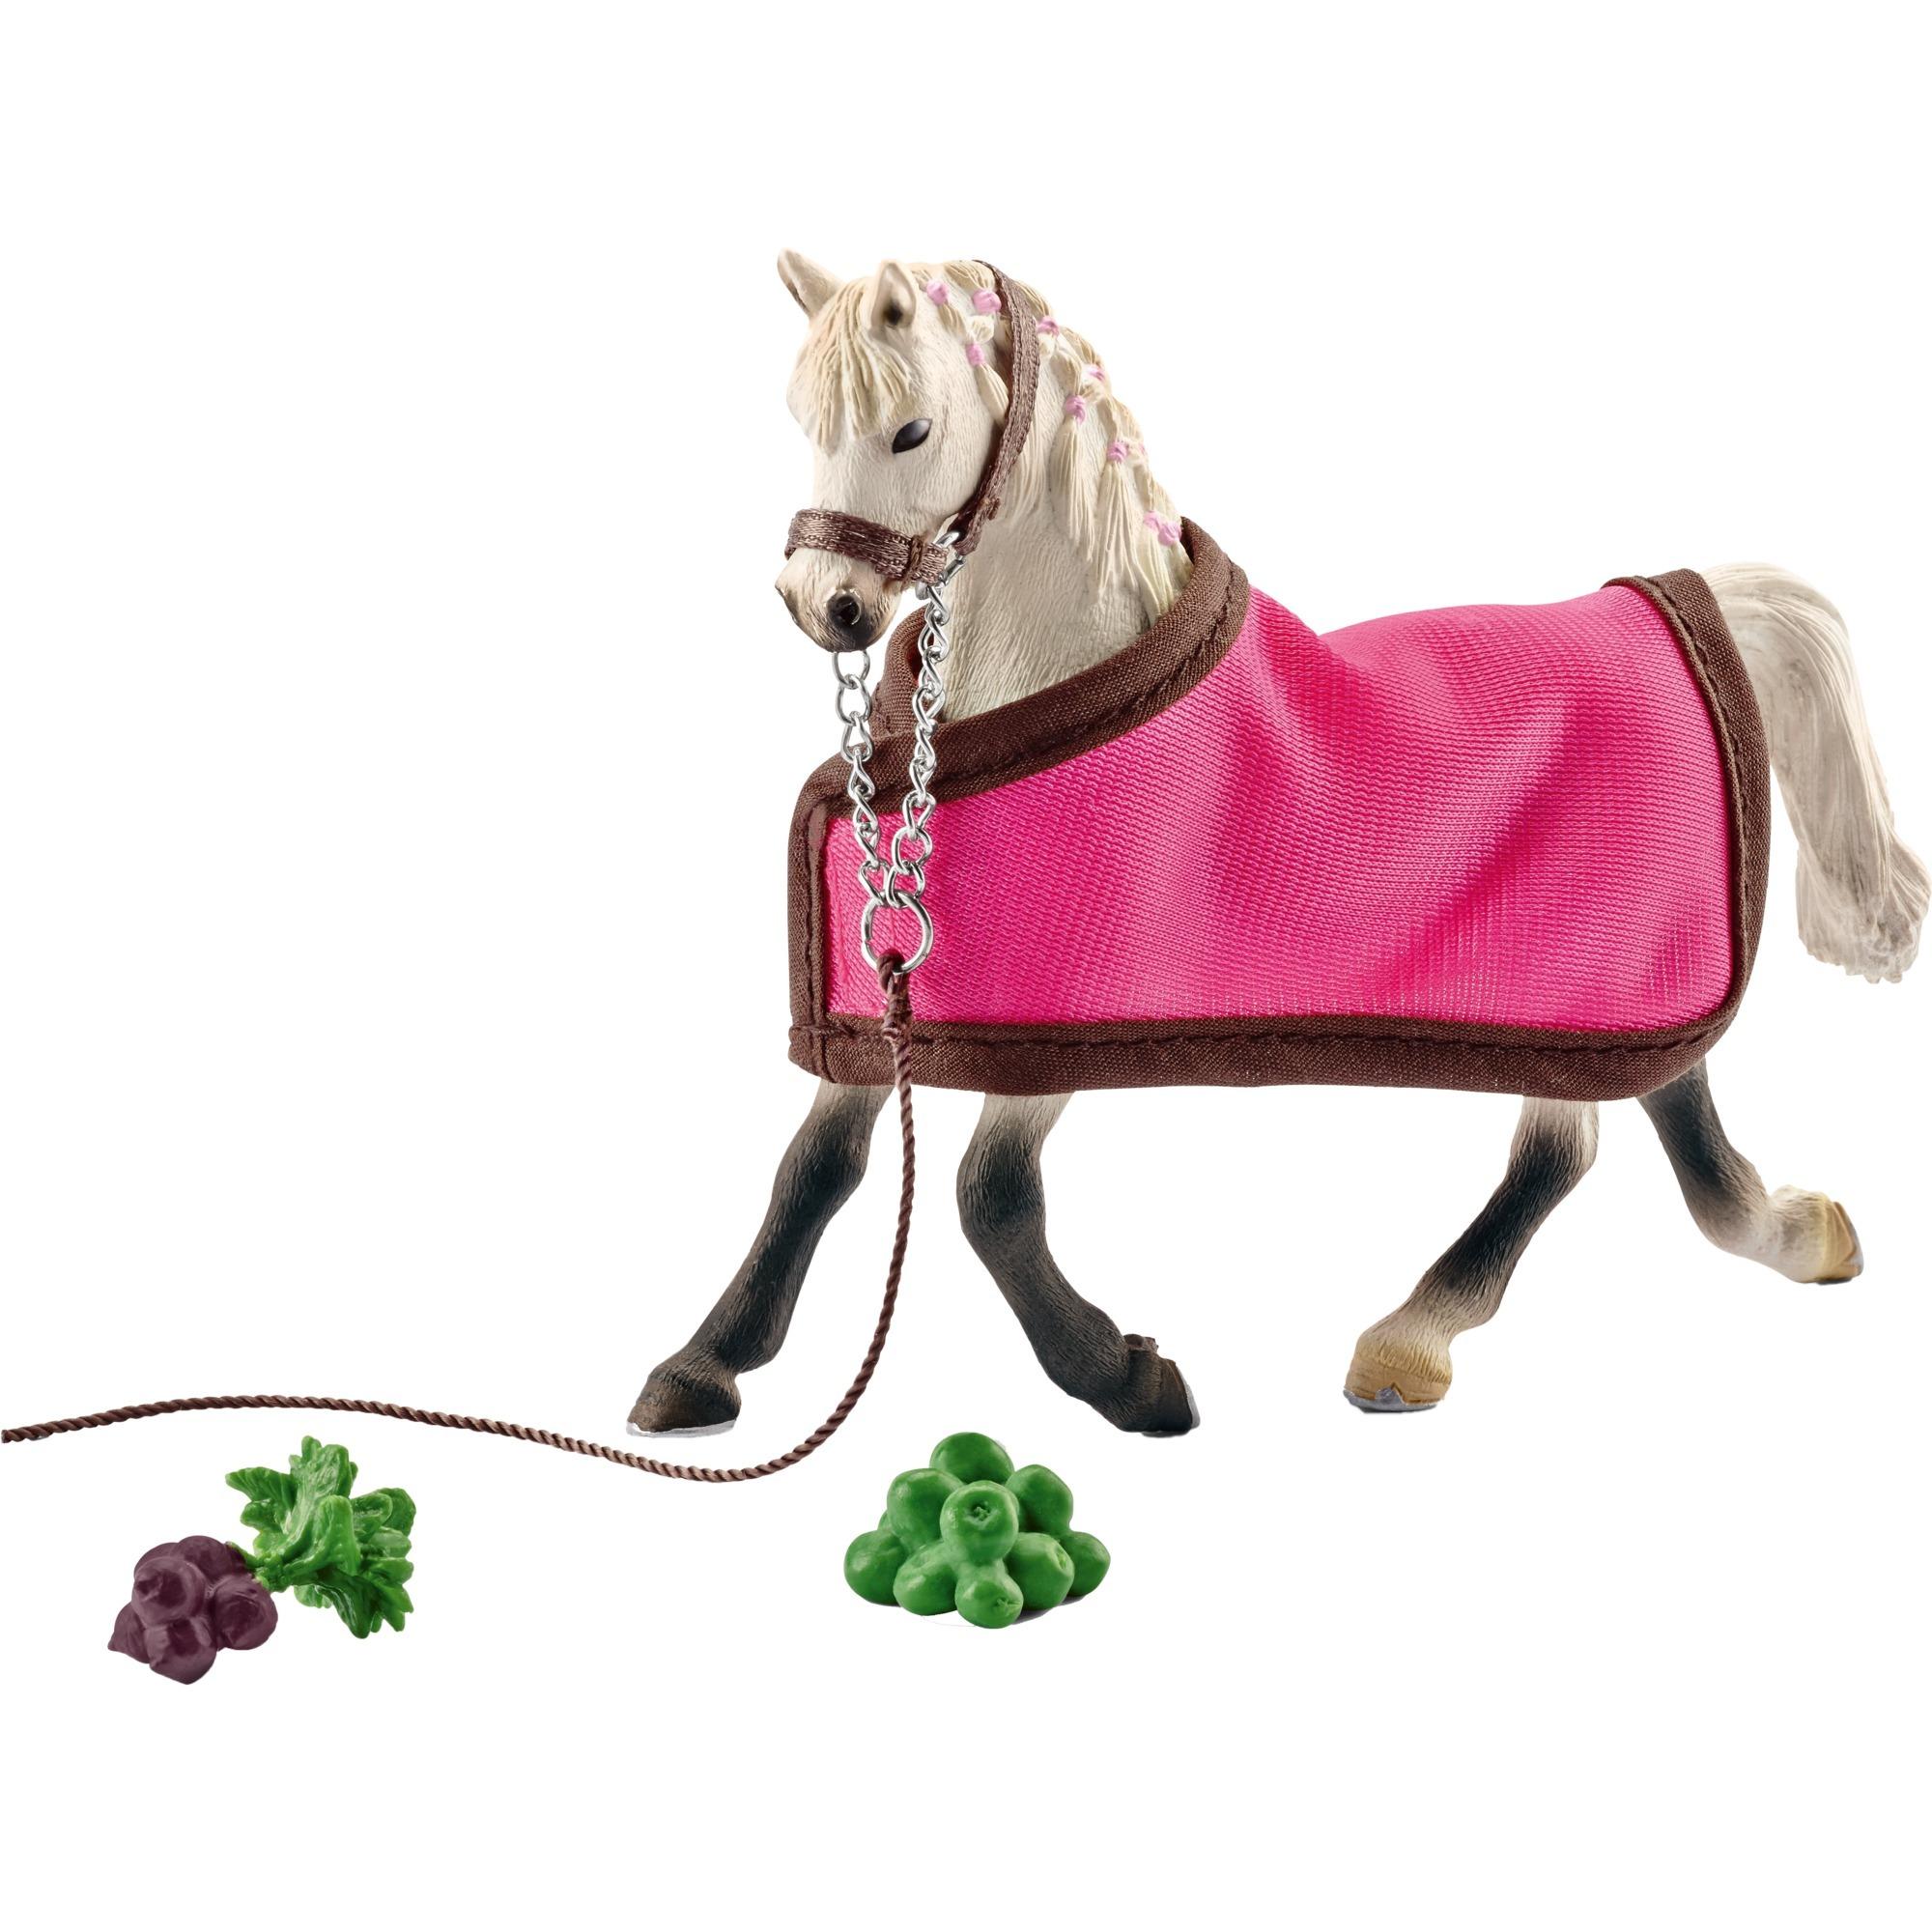 arab-mare-with-blanket-spil-figur